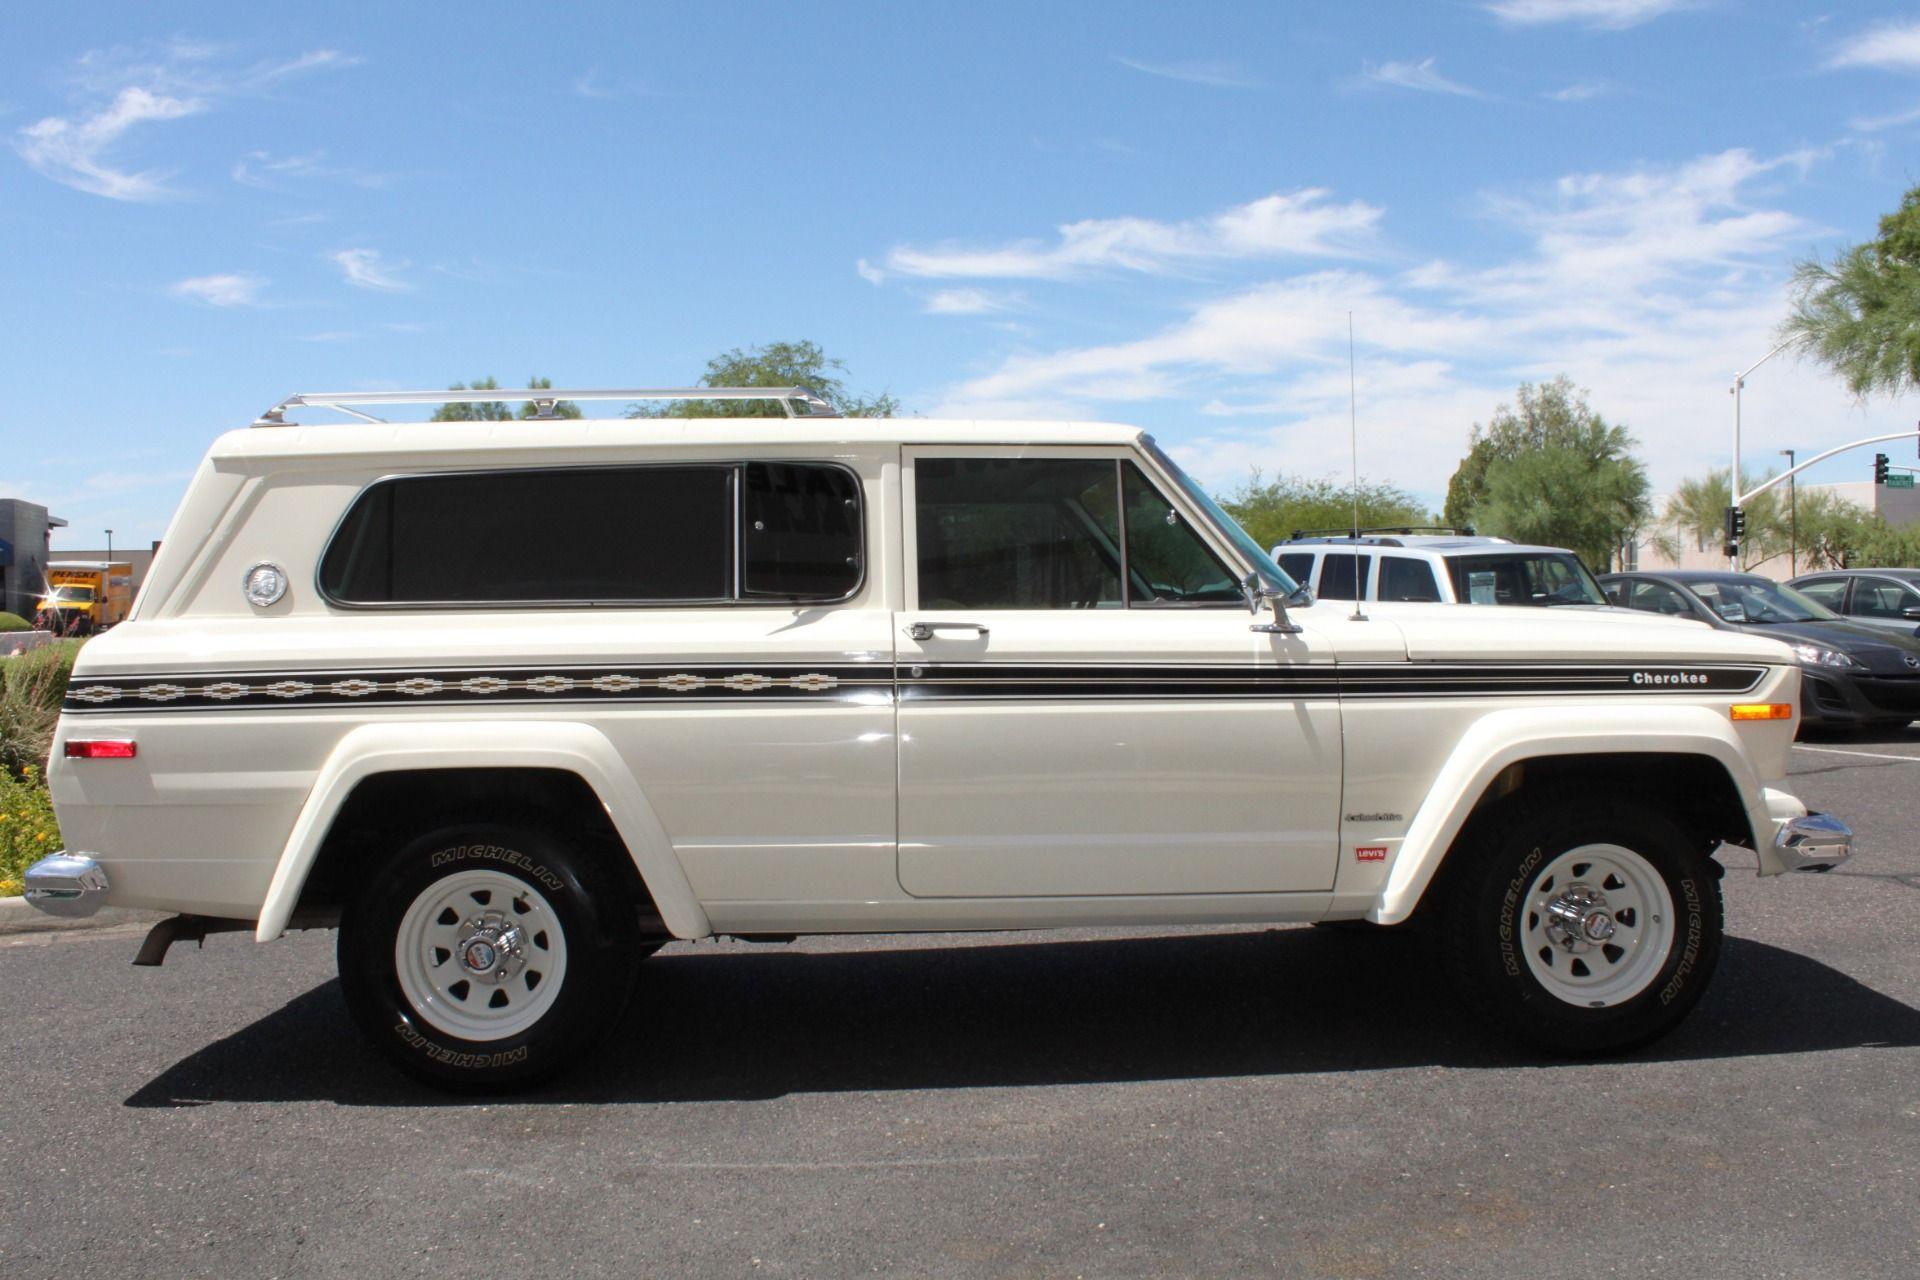 1977 Jeep Cherokee S Widetrack 4x4 401 V8 Stock P1236 For Sale Near Scottsdale Az Az Jeep Dealer Jeep Cherokee Jeep Dealer Jeep